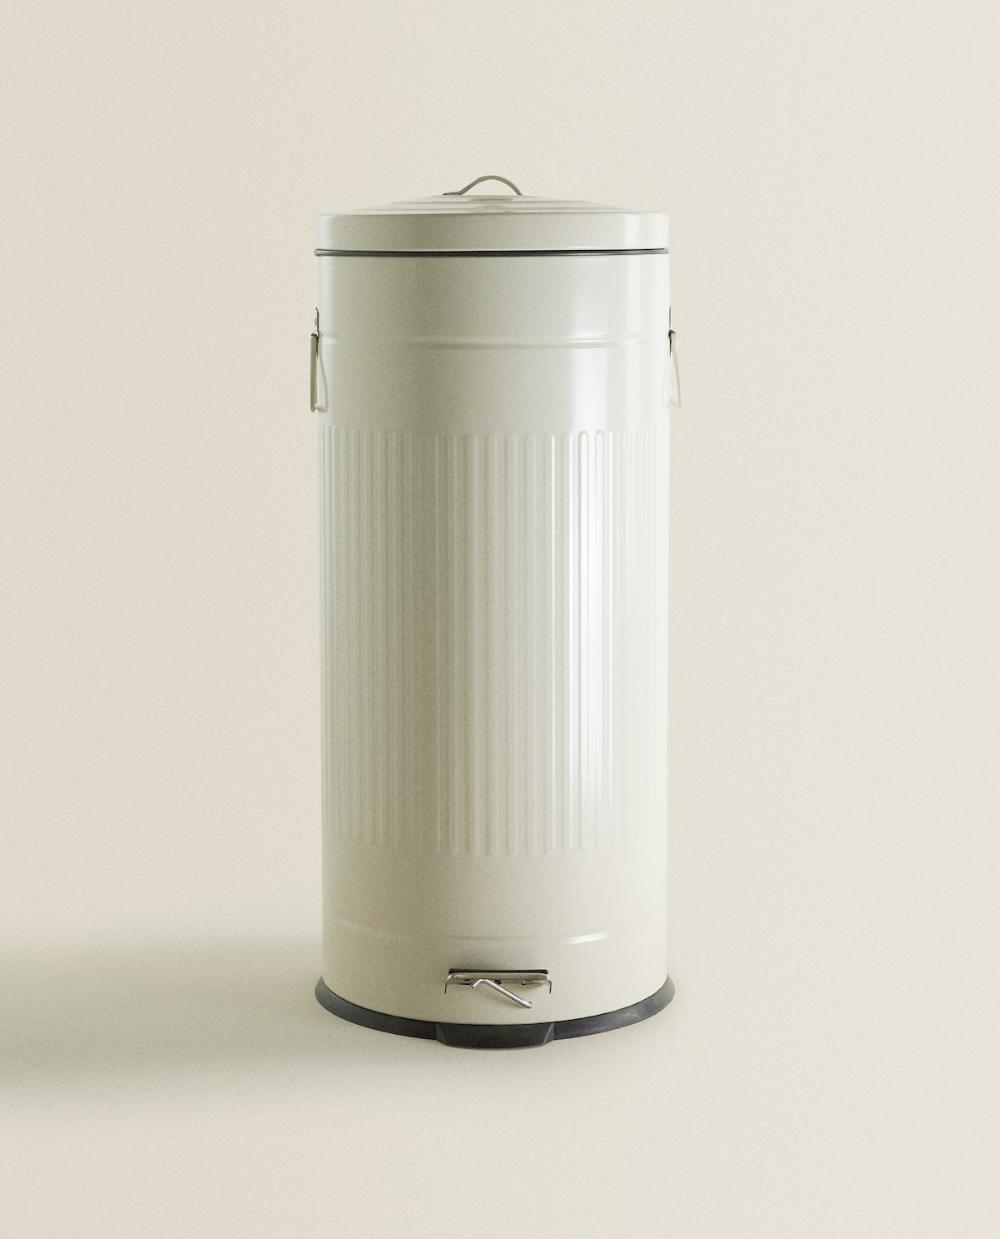 White Enamel Kitchen Garbage Can